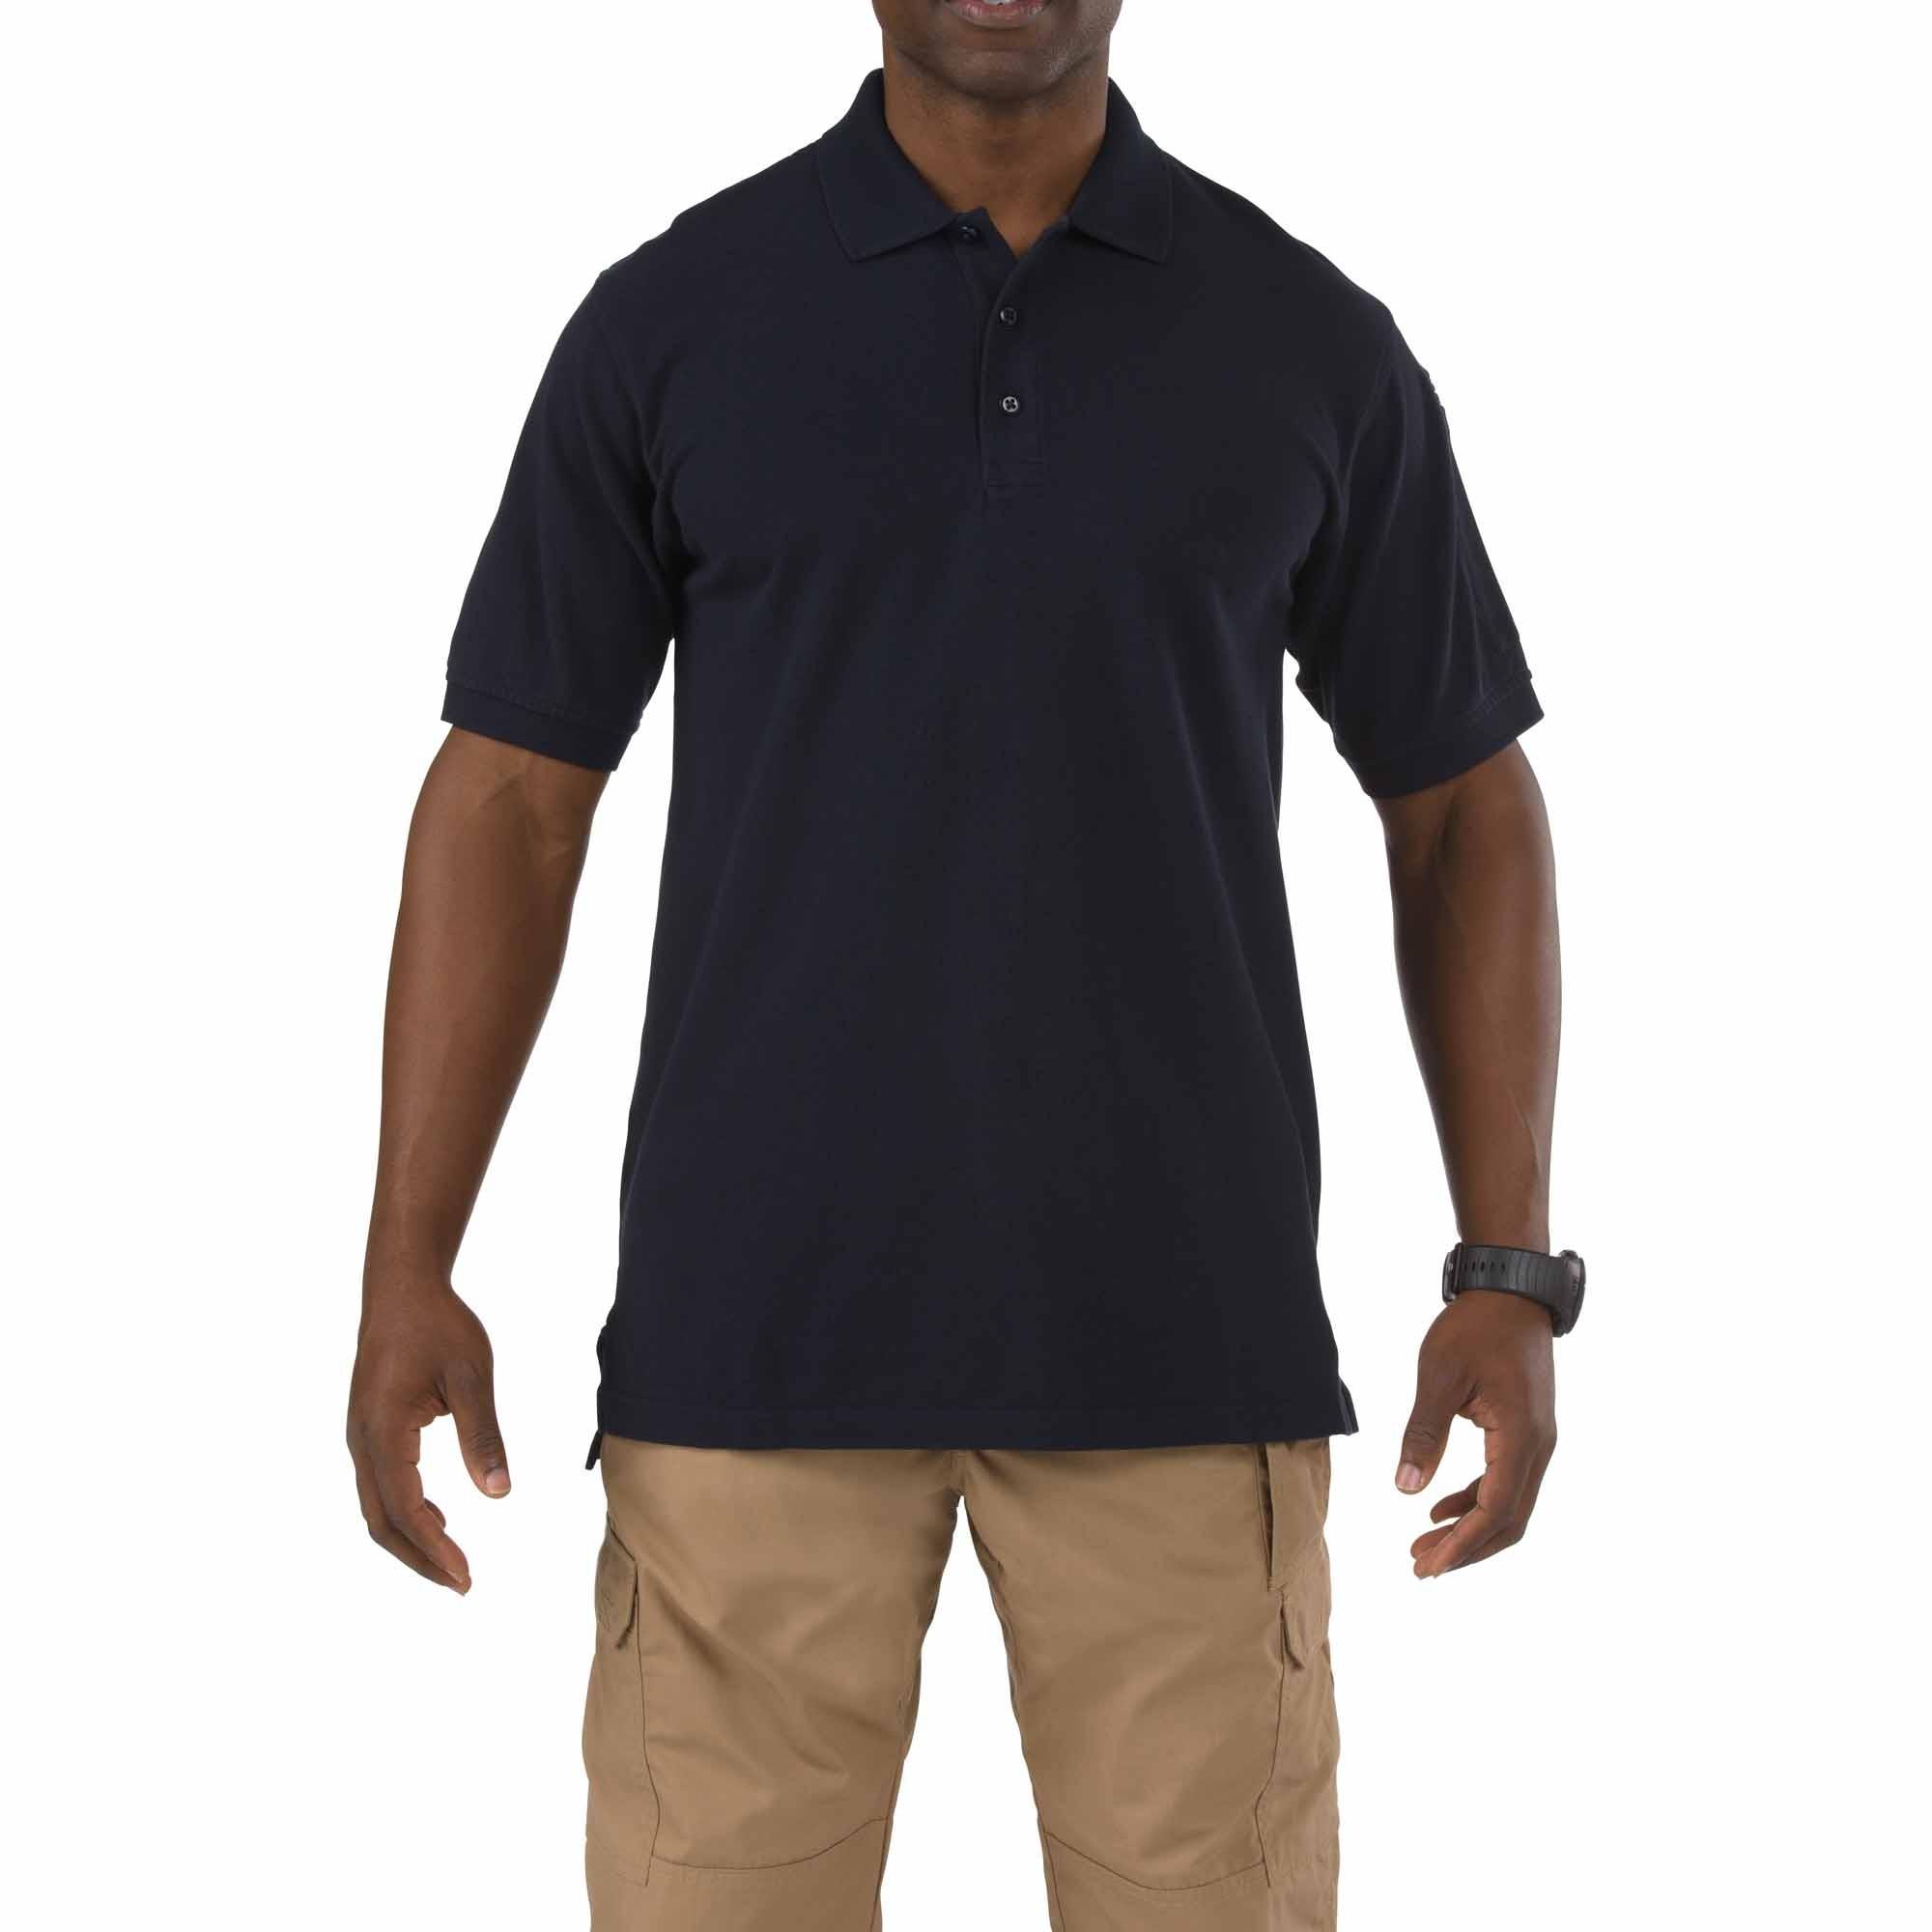 Camisa Polo Profissional - 5.11